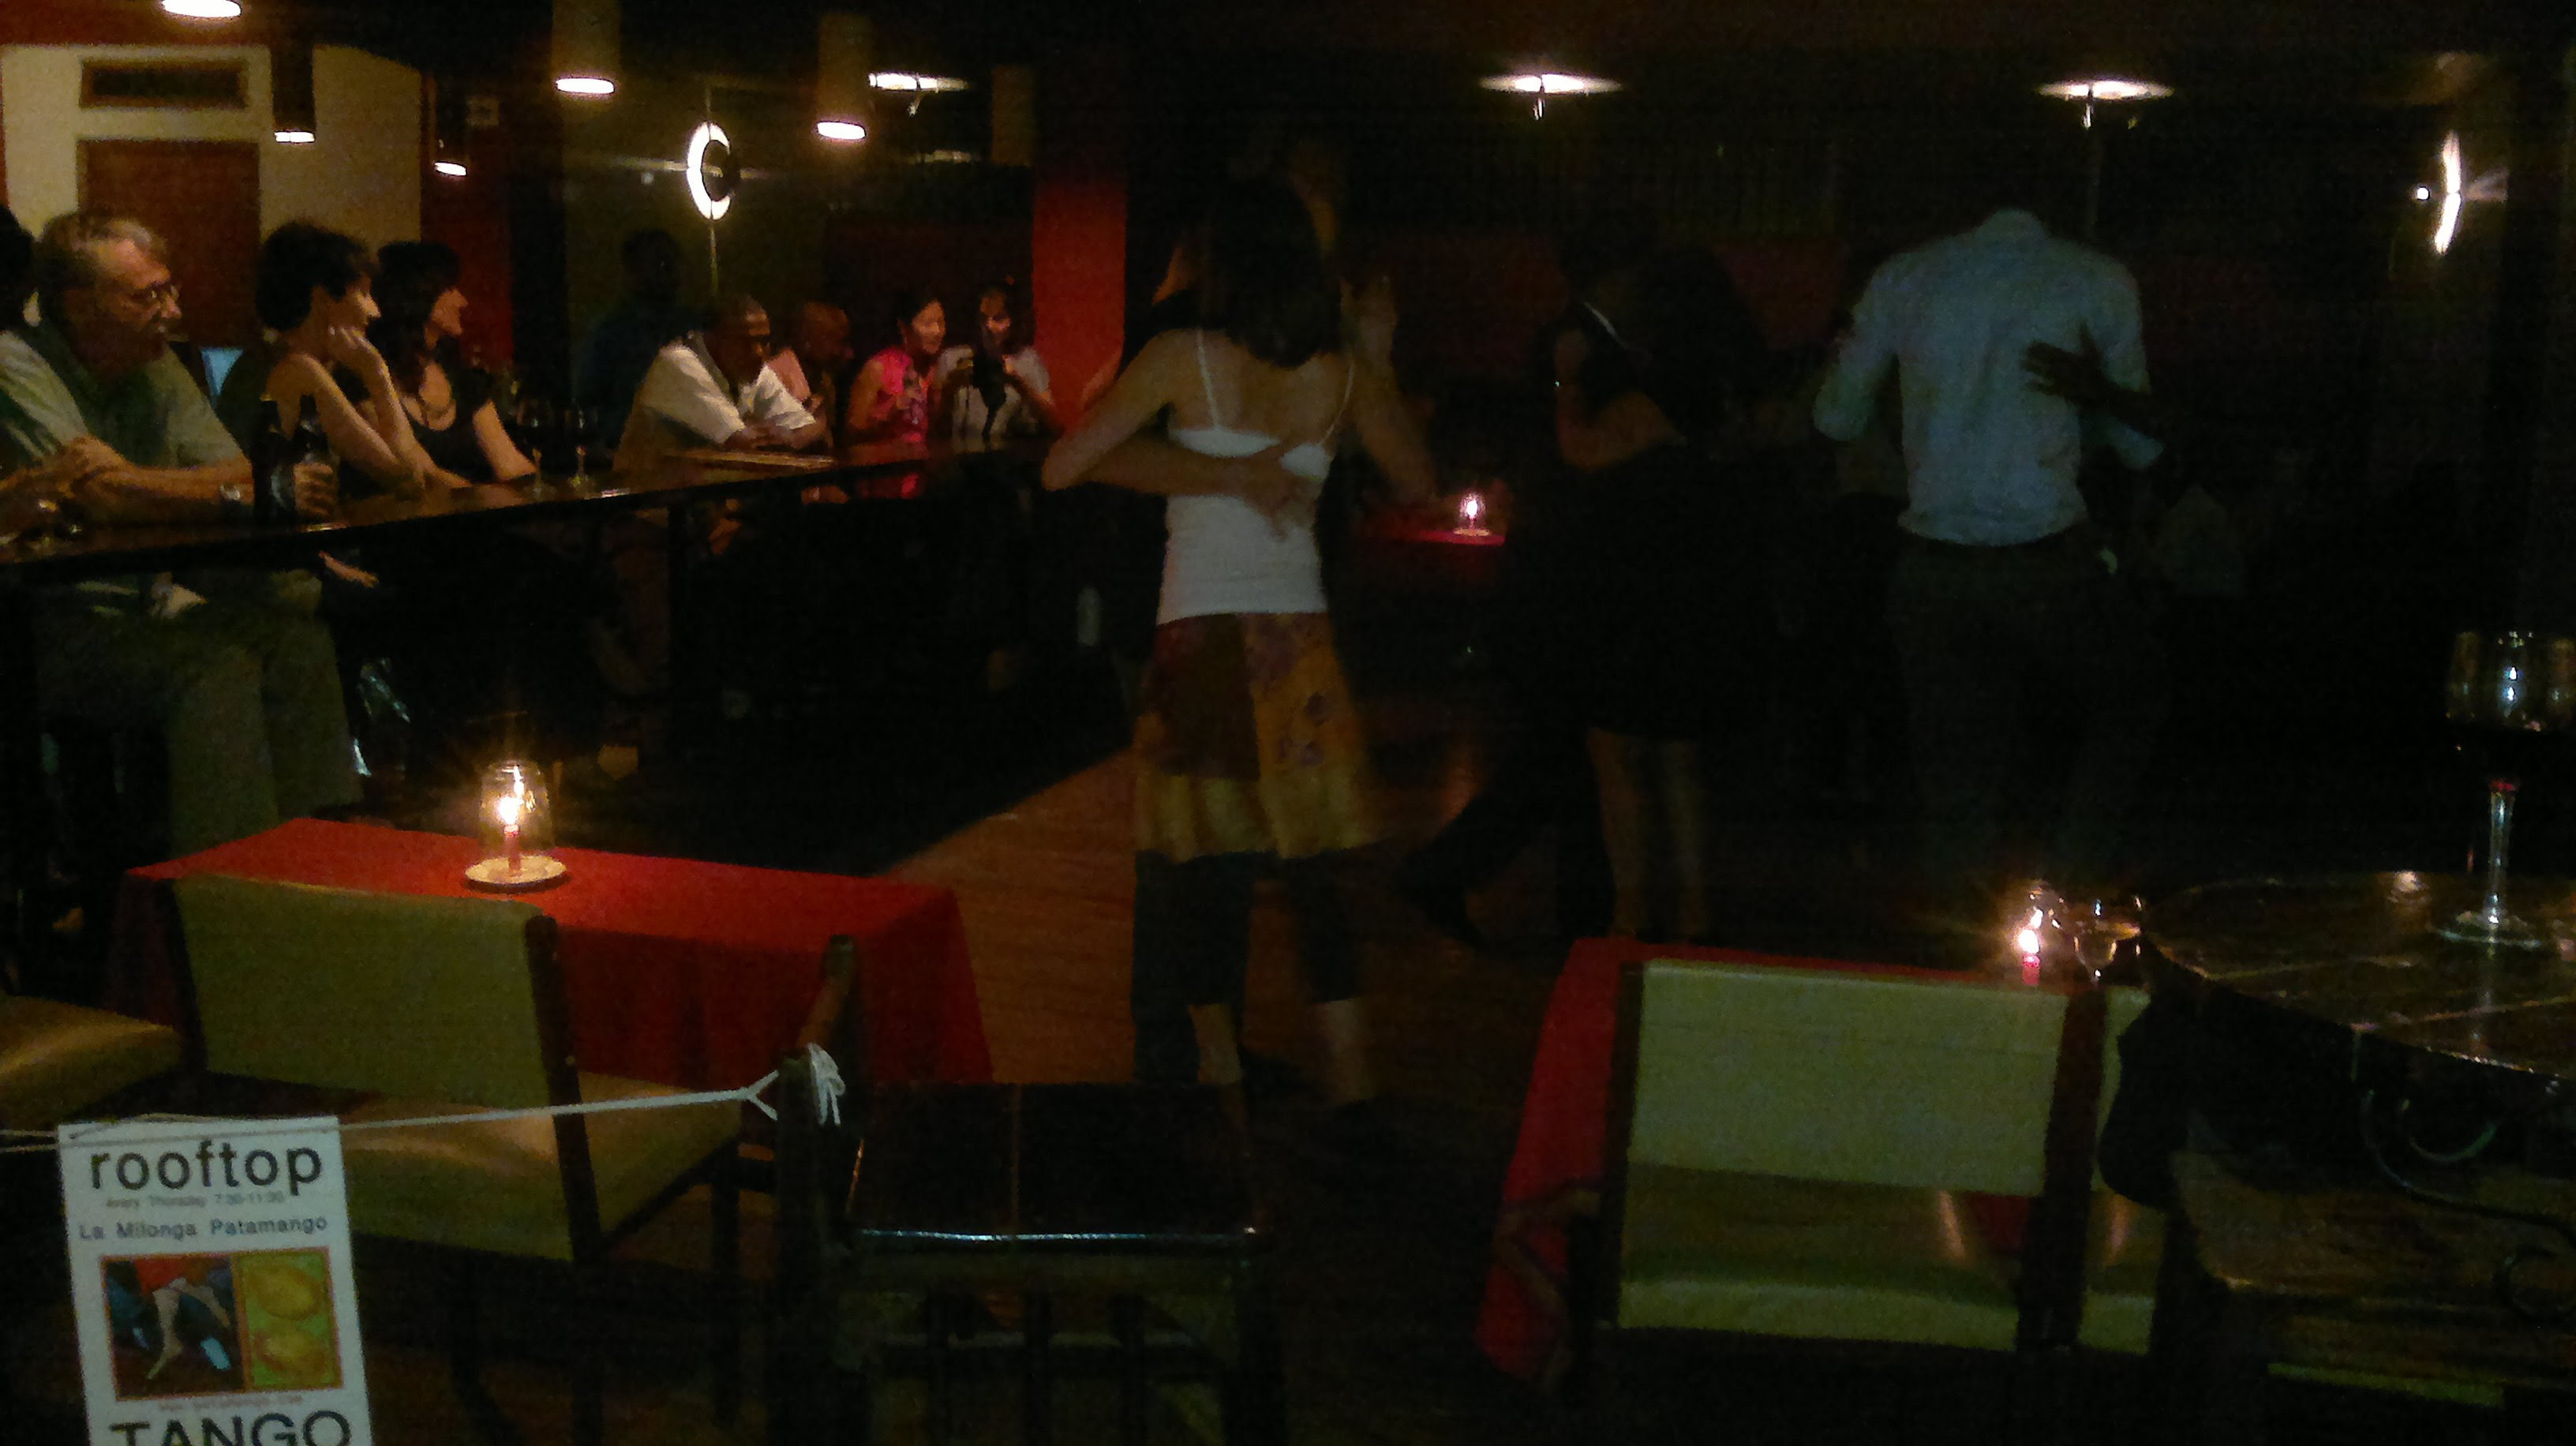 La Milonga Patamango at Sippers Lounge on Thu 03 April 2014